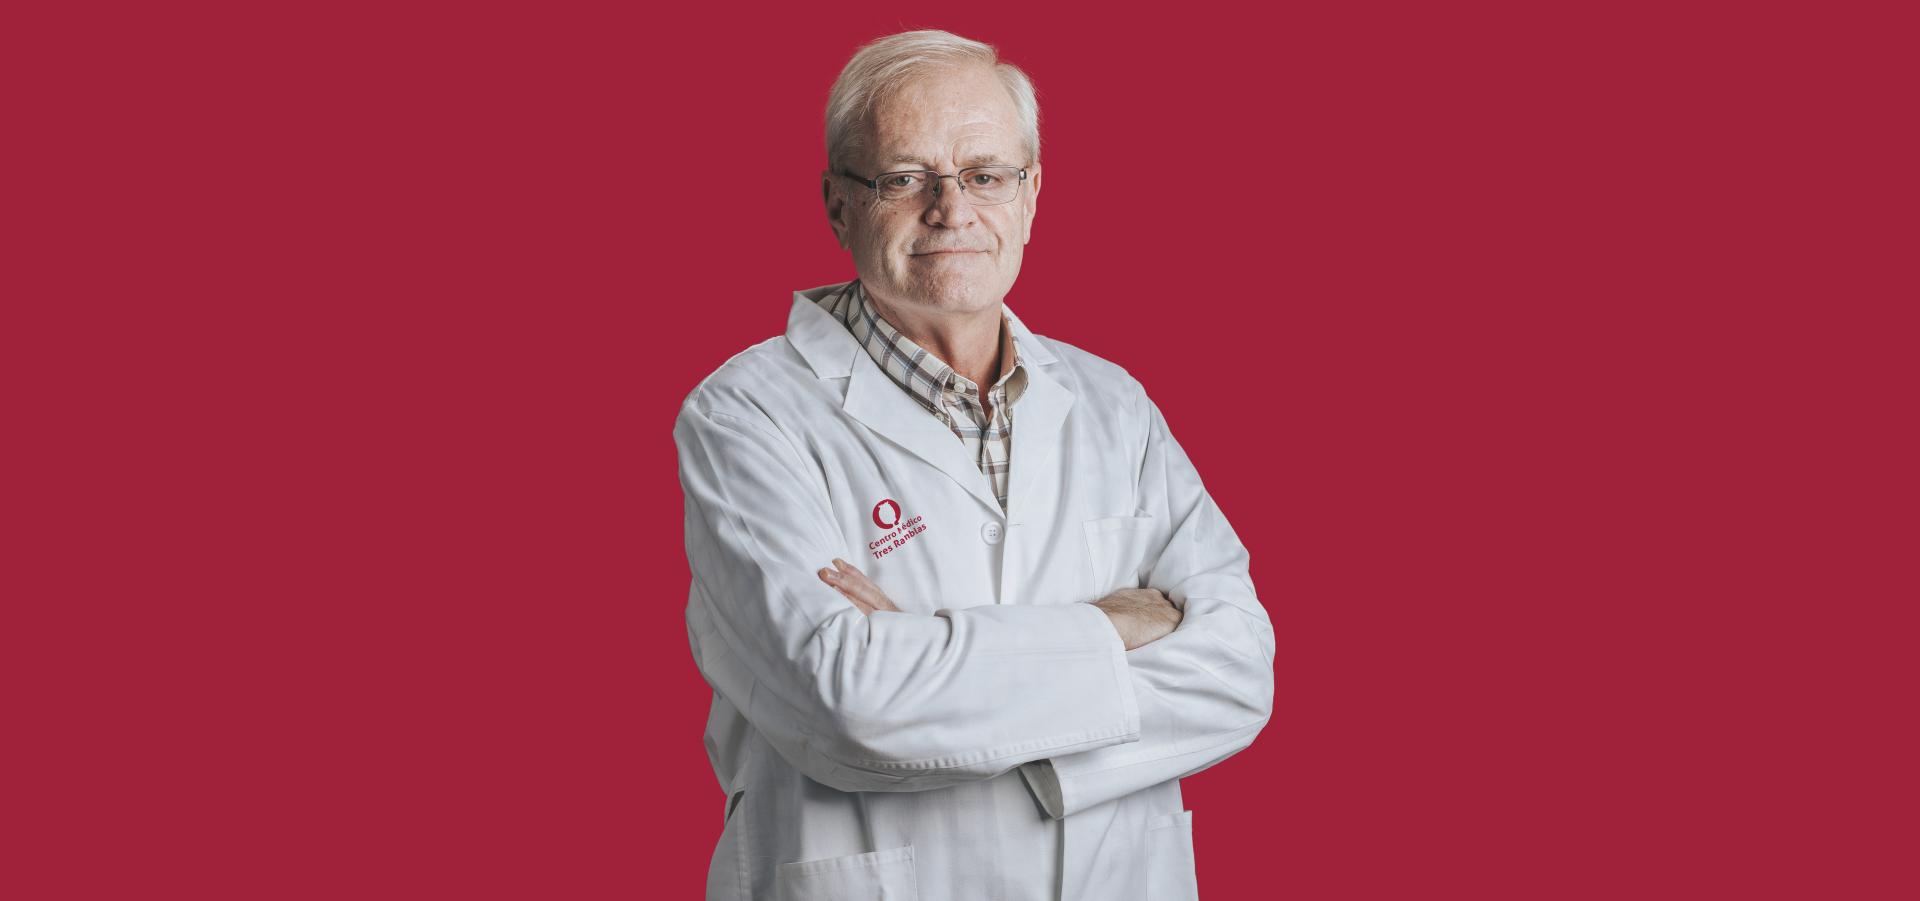 Dr. Rodolfo Castillo Sainz